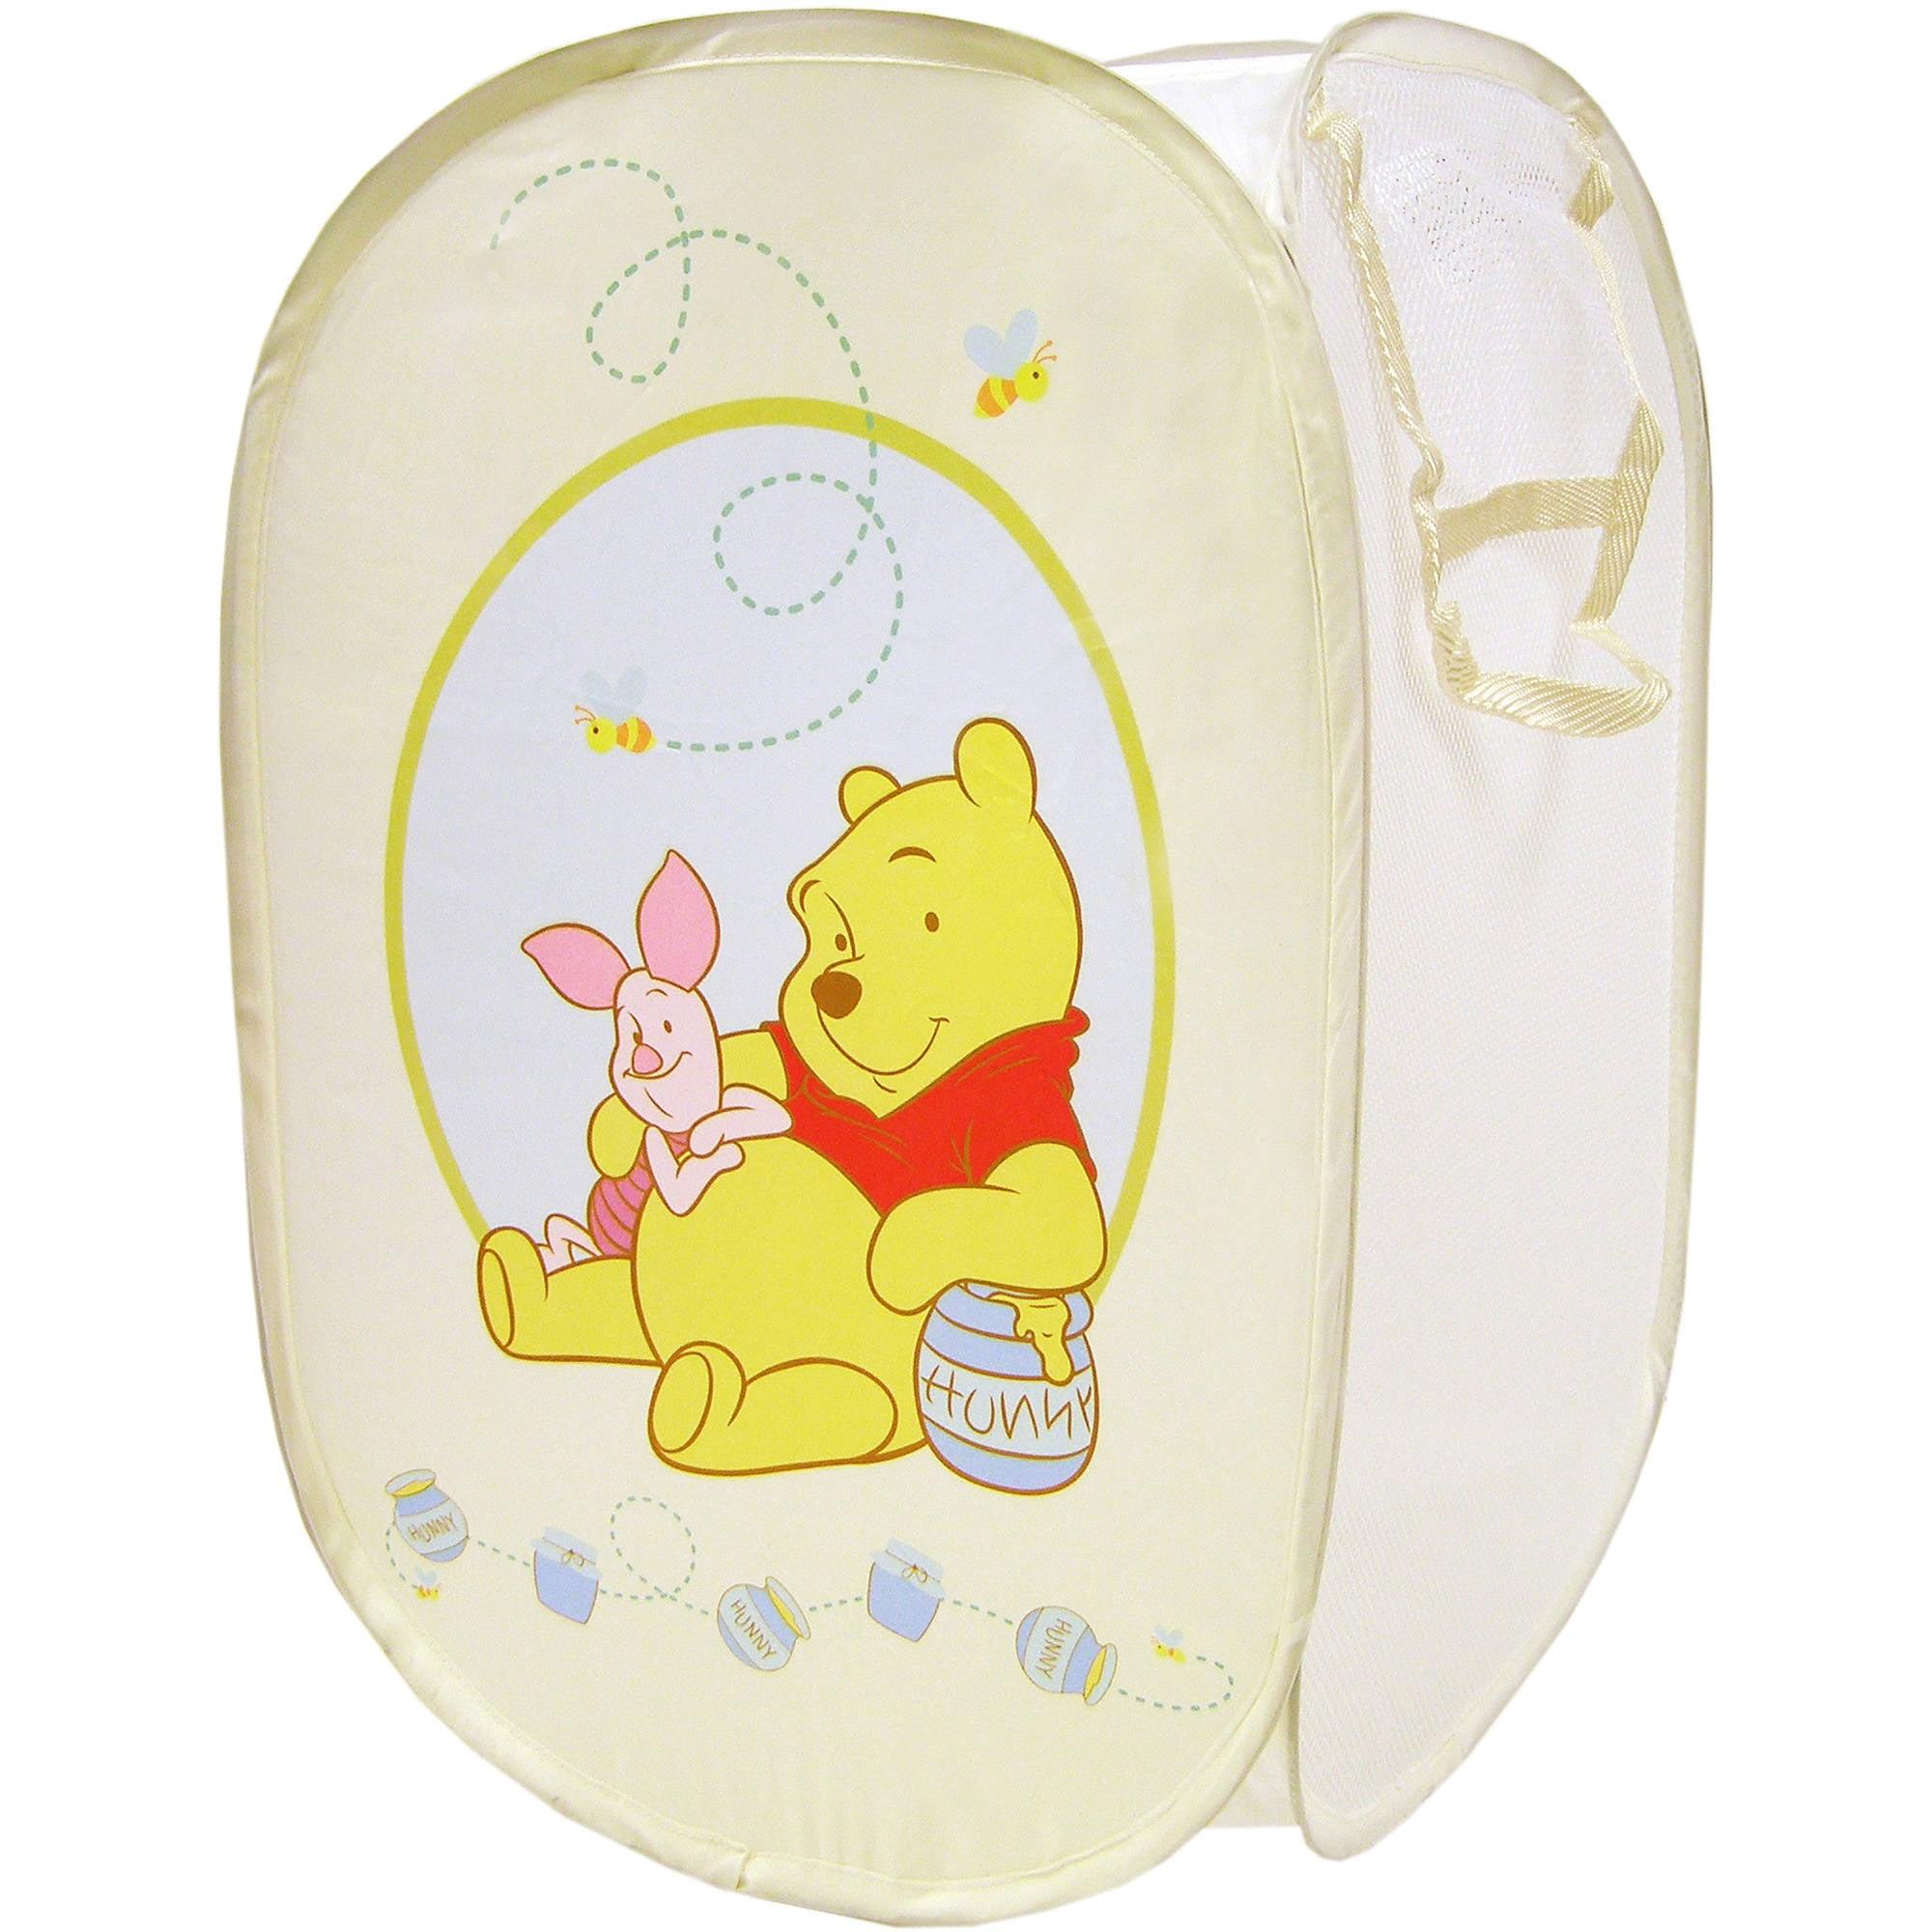 Disney Winnie the Pooh Square Hamper